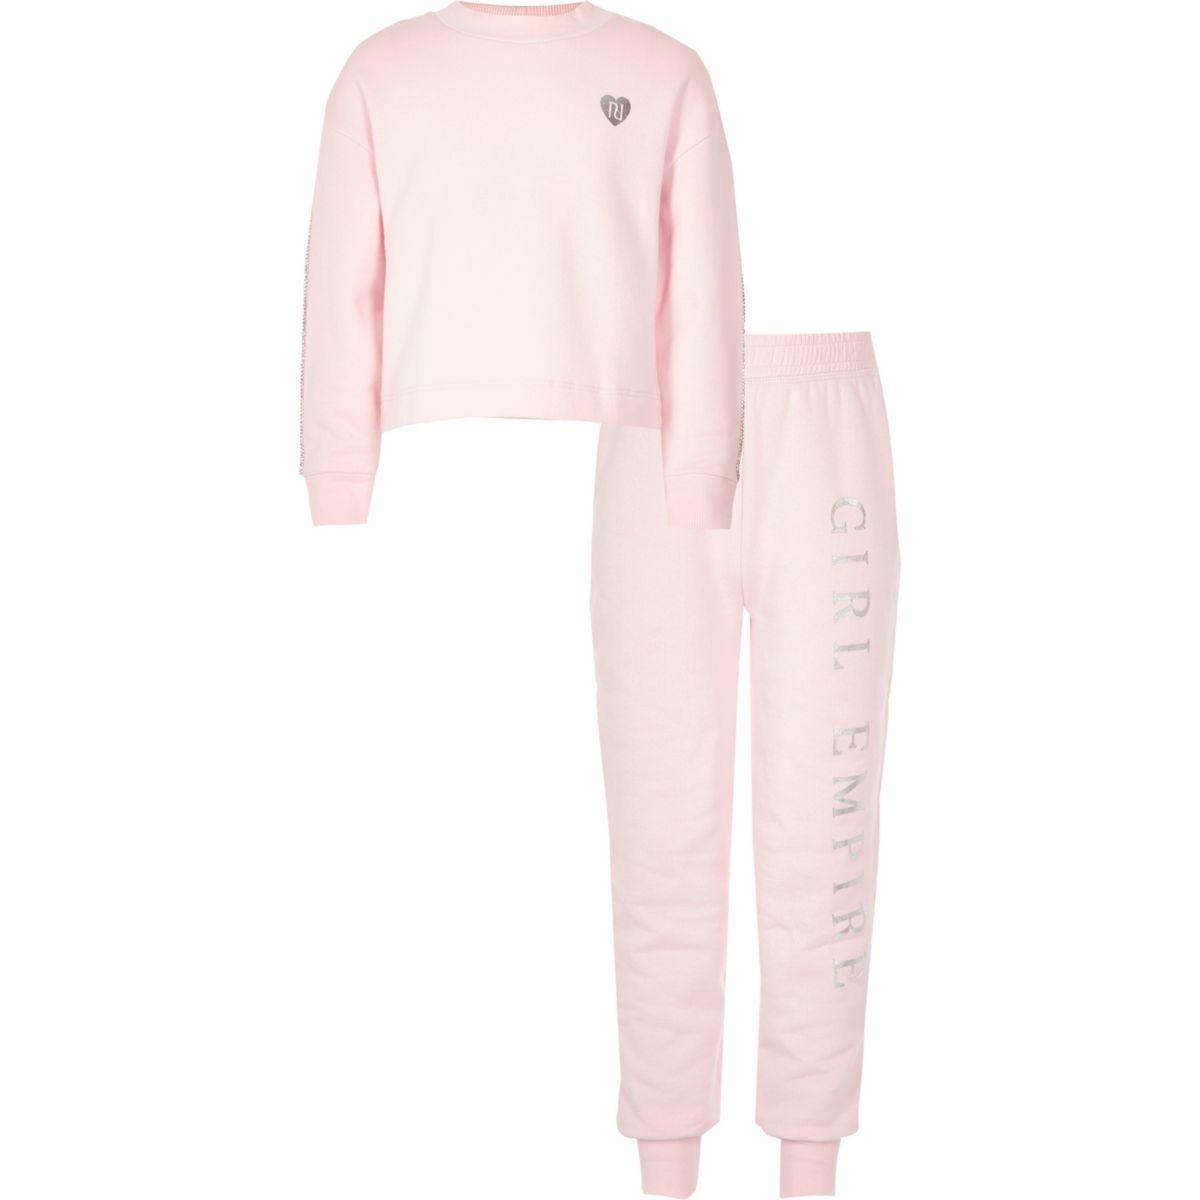 Girls light pink rhinestone trim sweat outfit